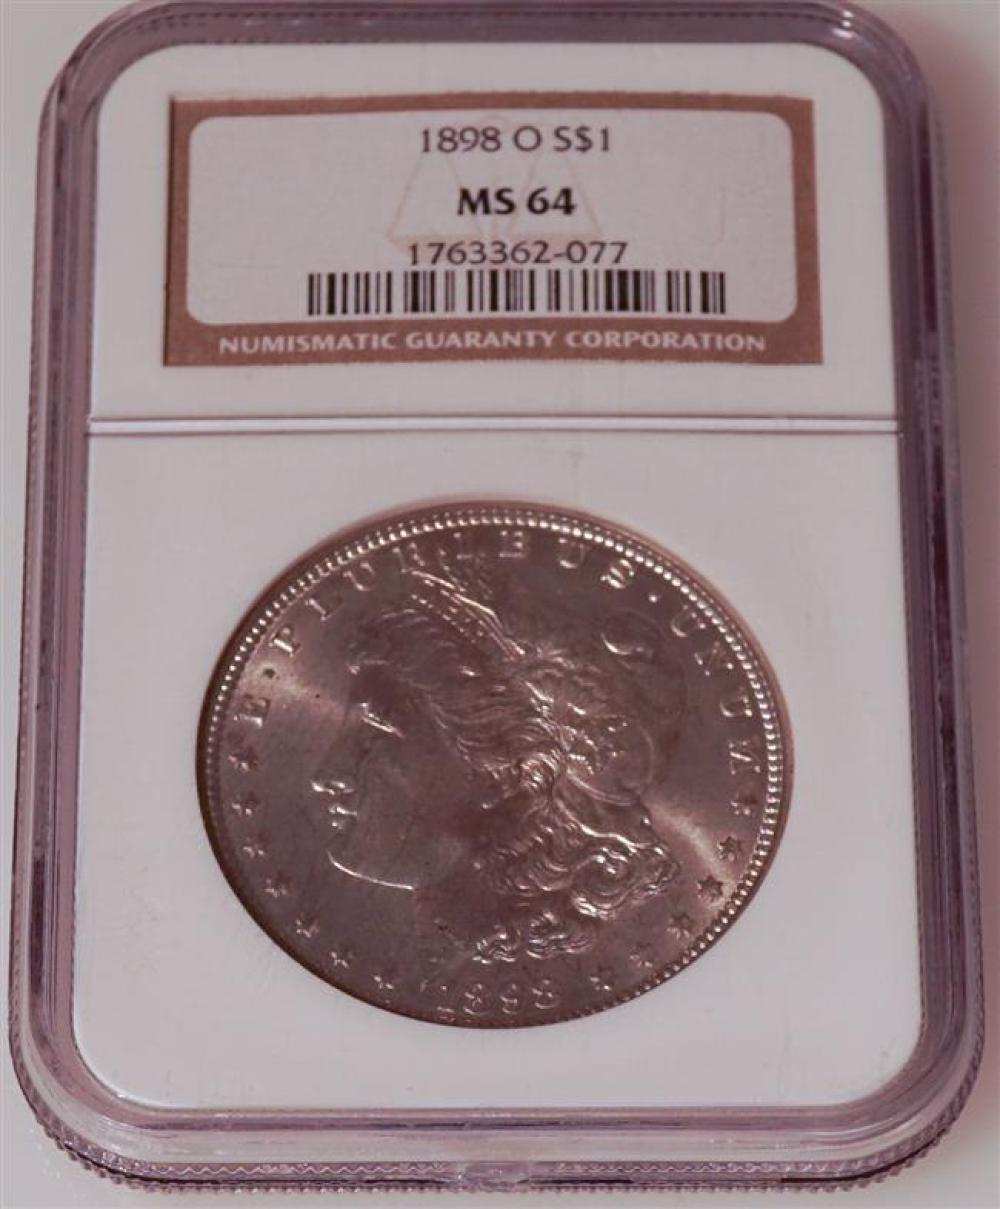 U.S. 1898-O Morgan Silver Dollar